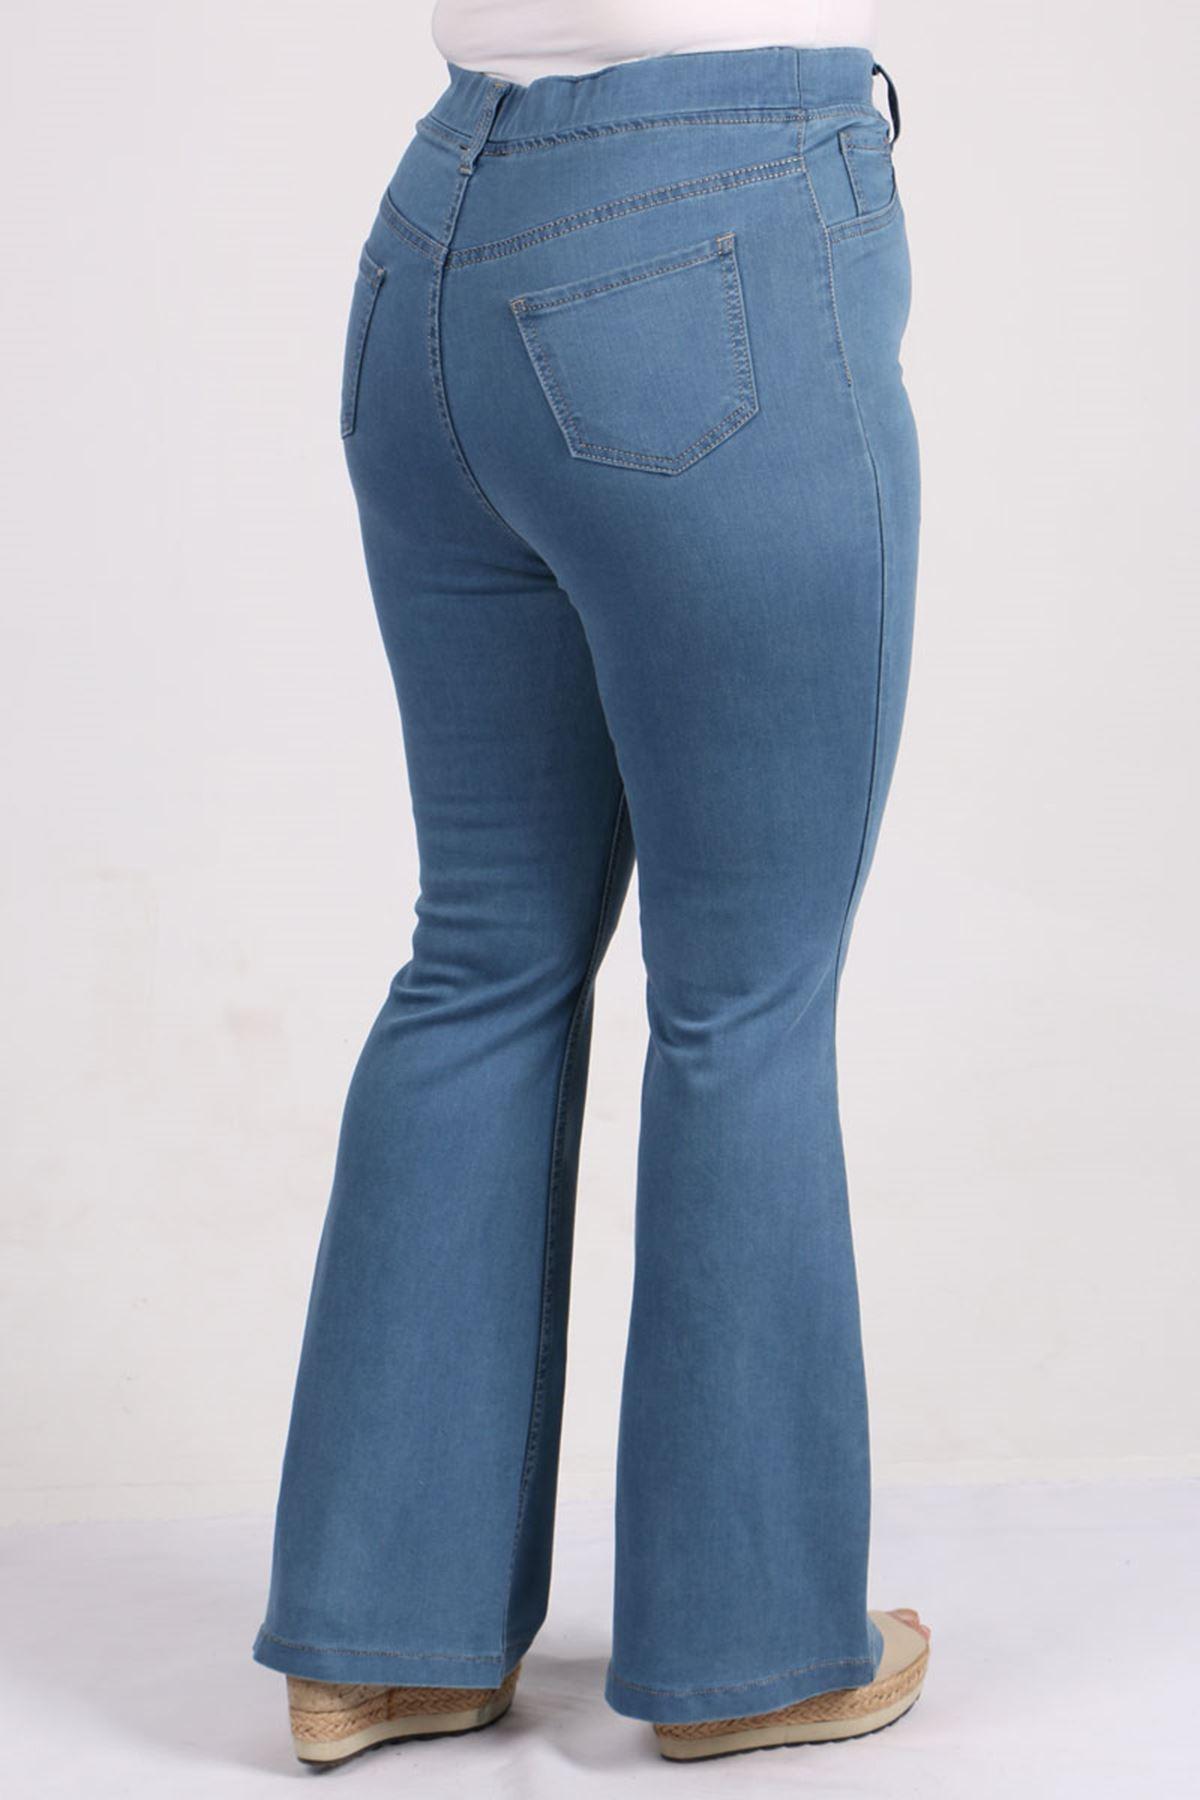 9137 Büyük Beden Beli Lastikli İspanyol Paça Kot Pantalon-Bebe Mavi